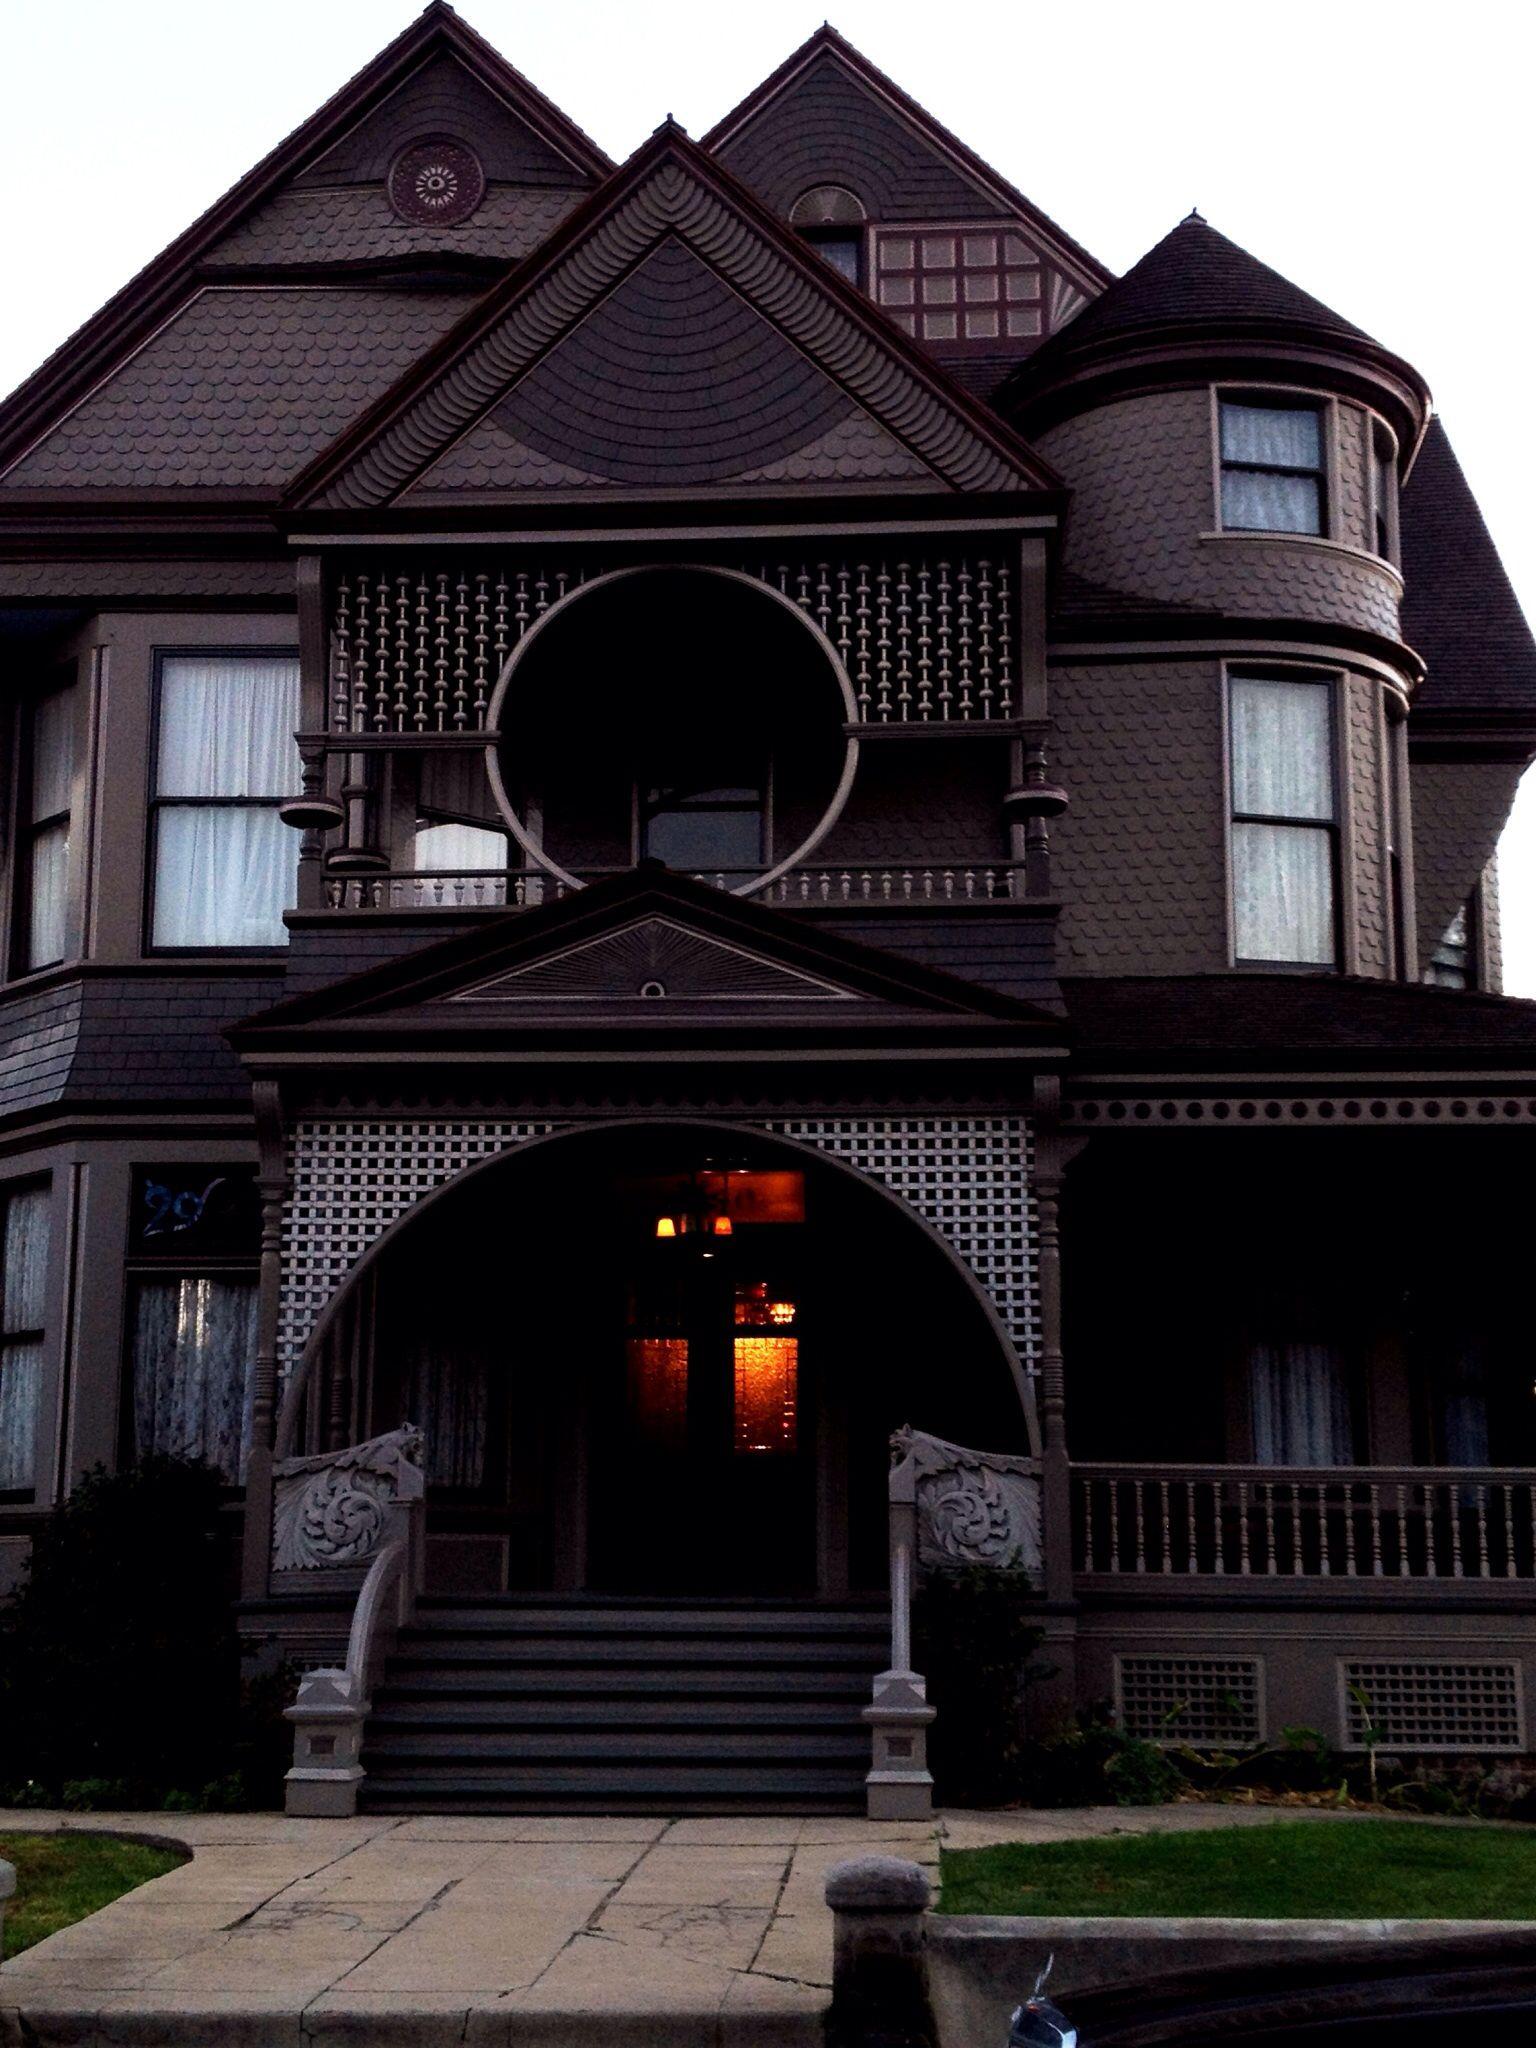 Victorian Era Decor Victorian Era Home In Angeleno Heights Los Angeles Architecture